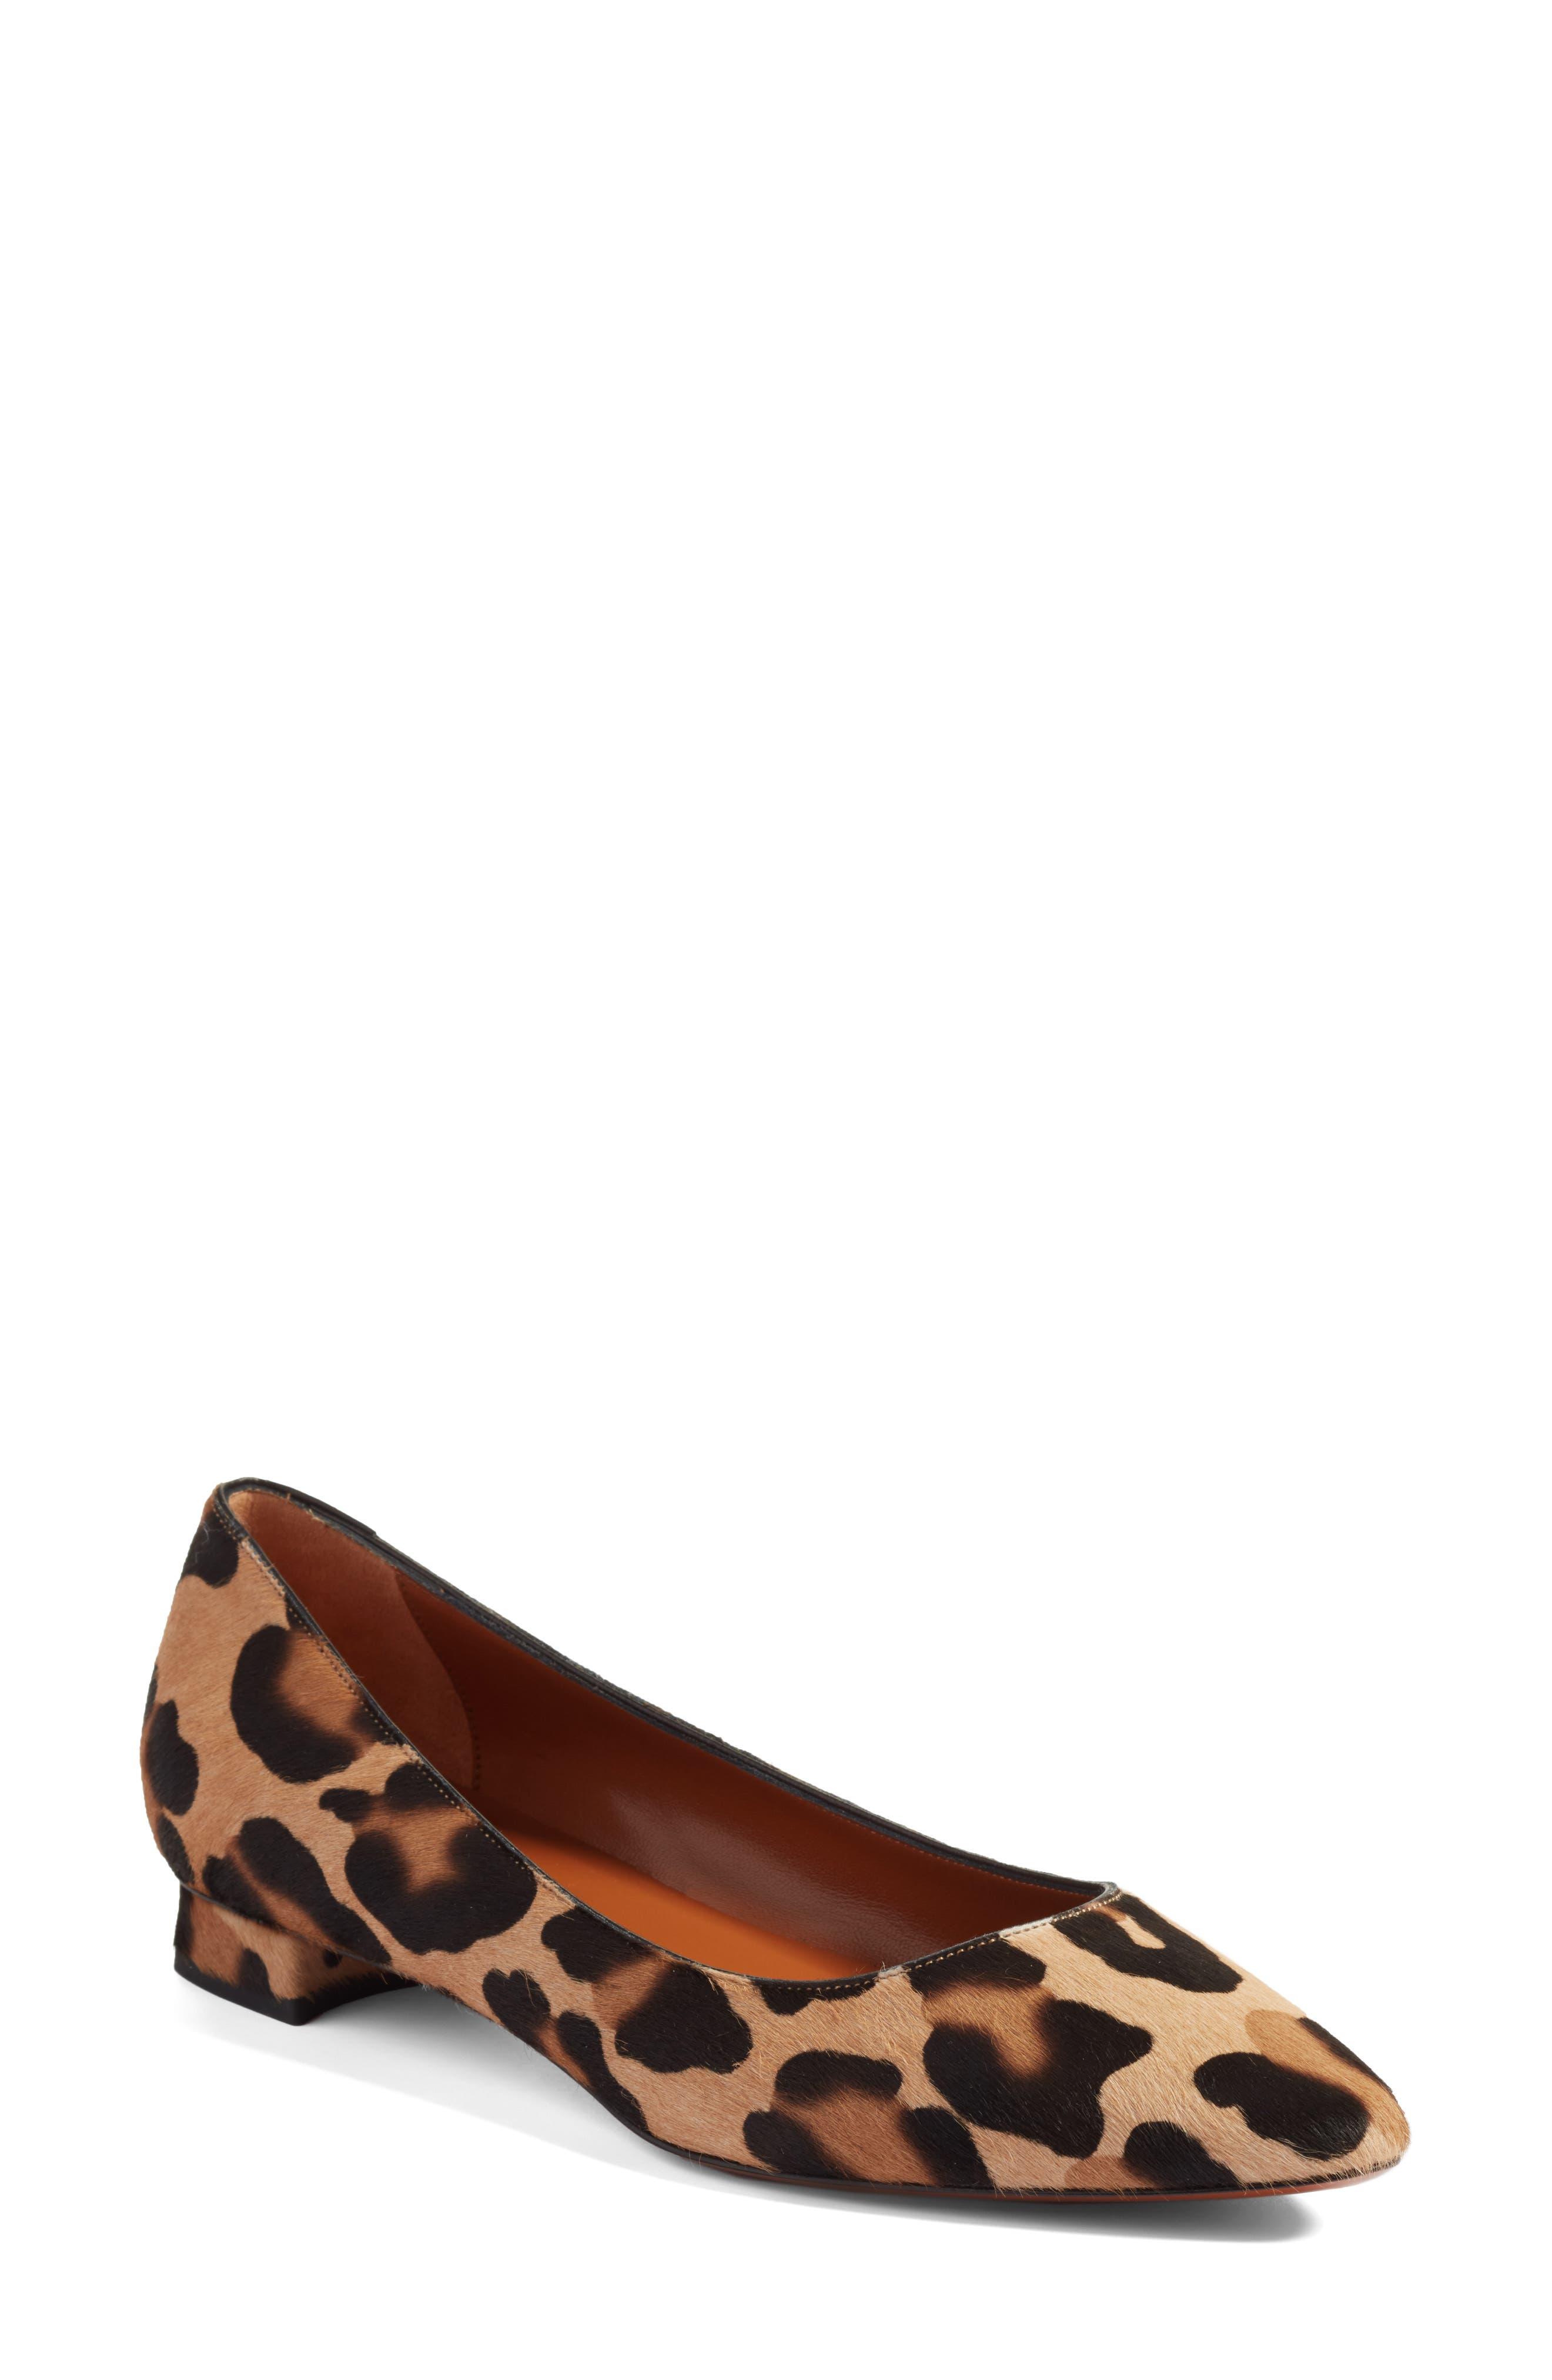 Main Image - Aquatalia Perla Weatherproof Genuine Calf Hair Ballerina Shoe (Women)